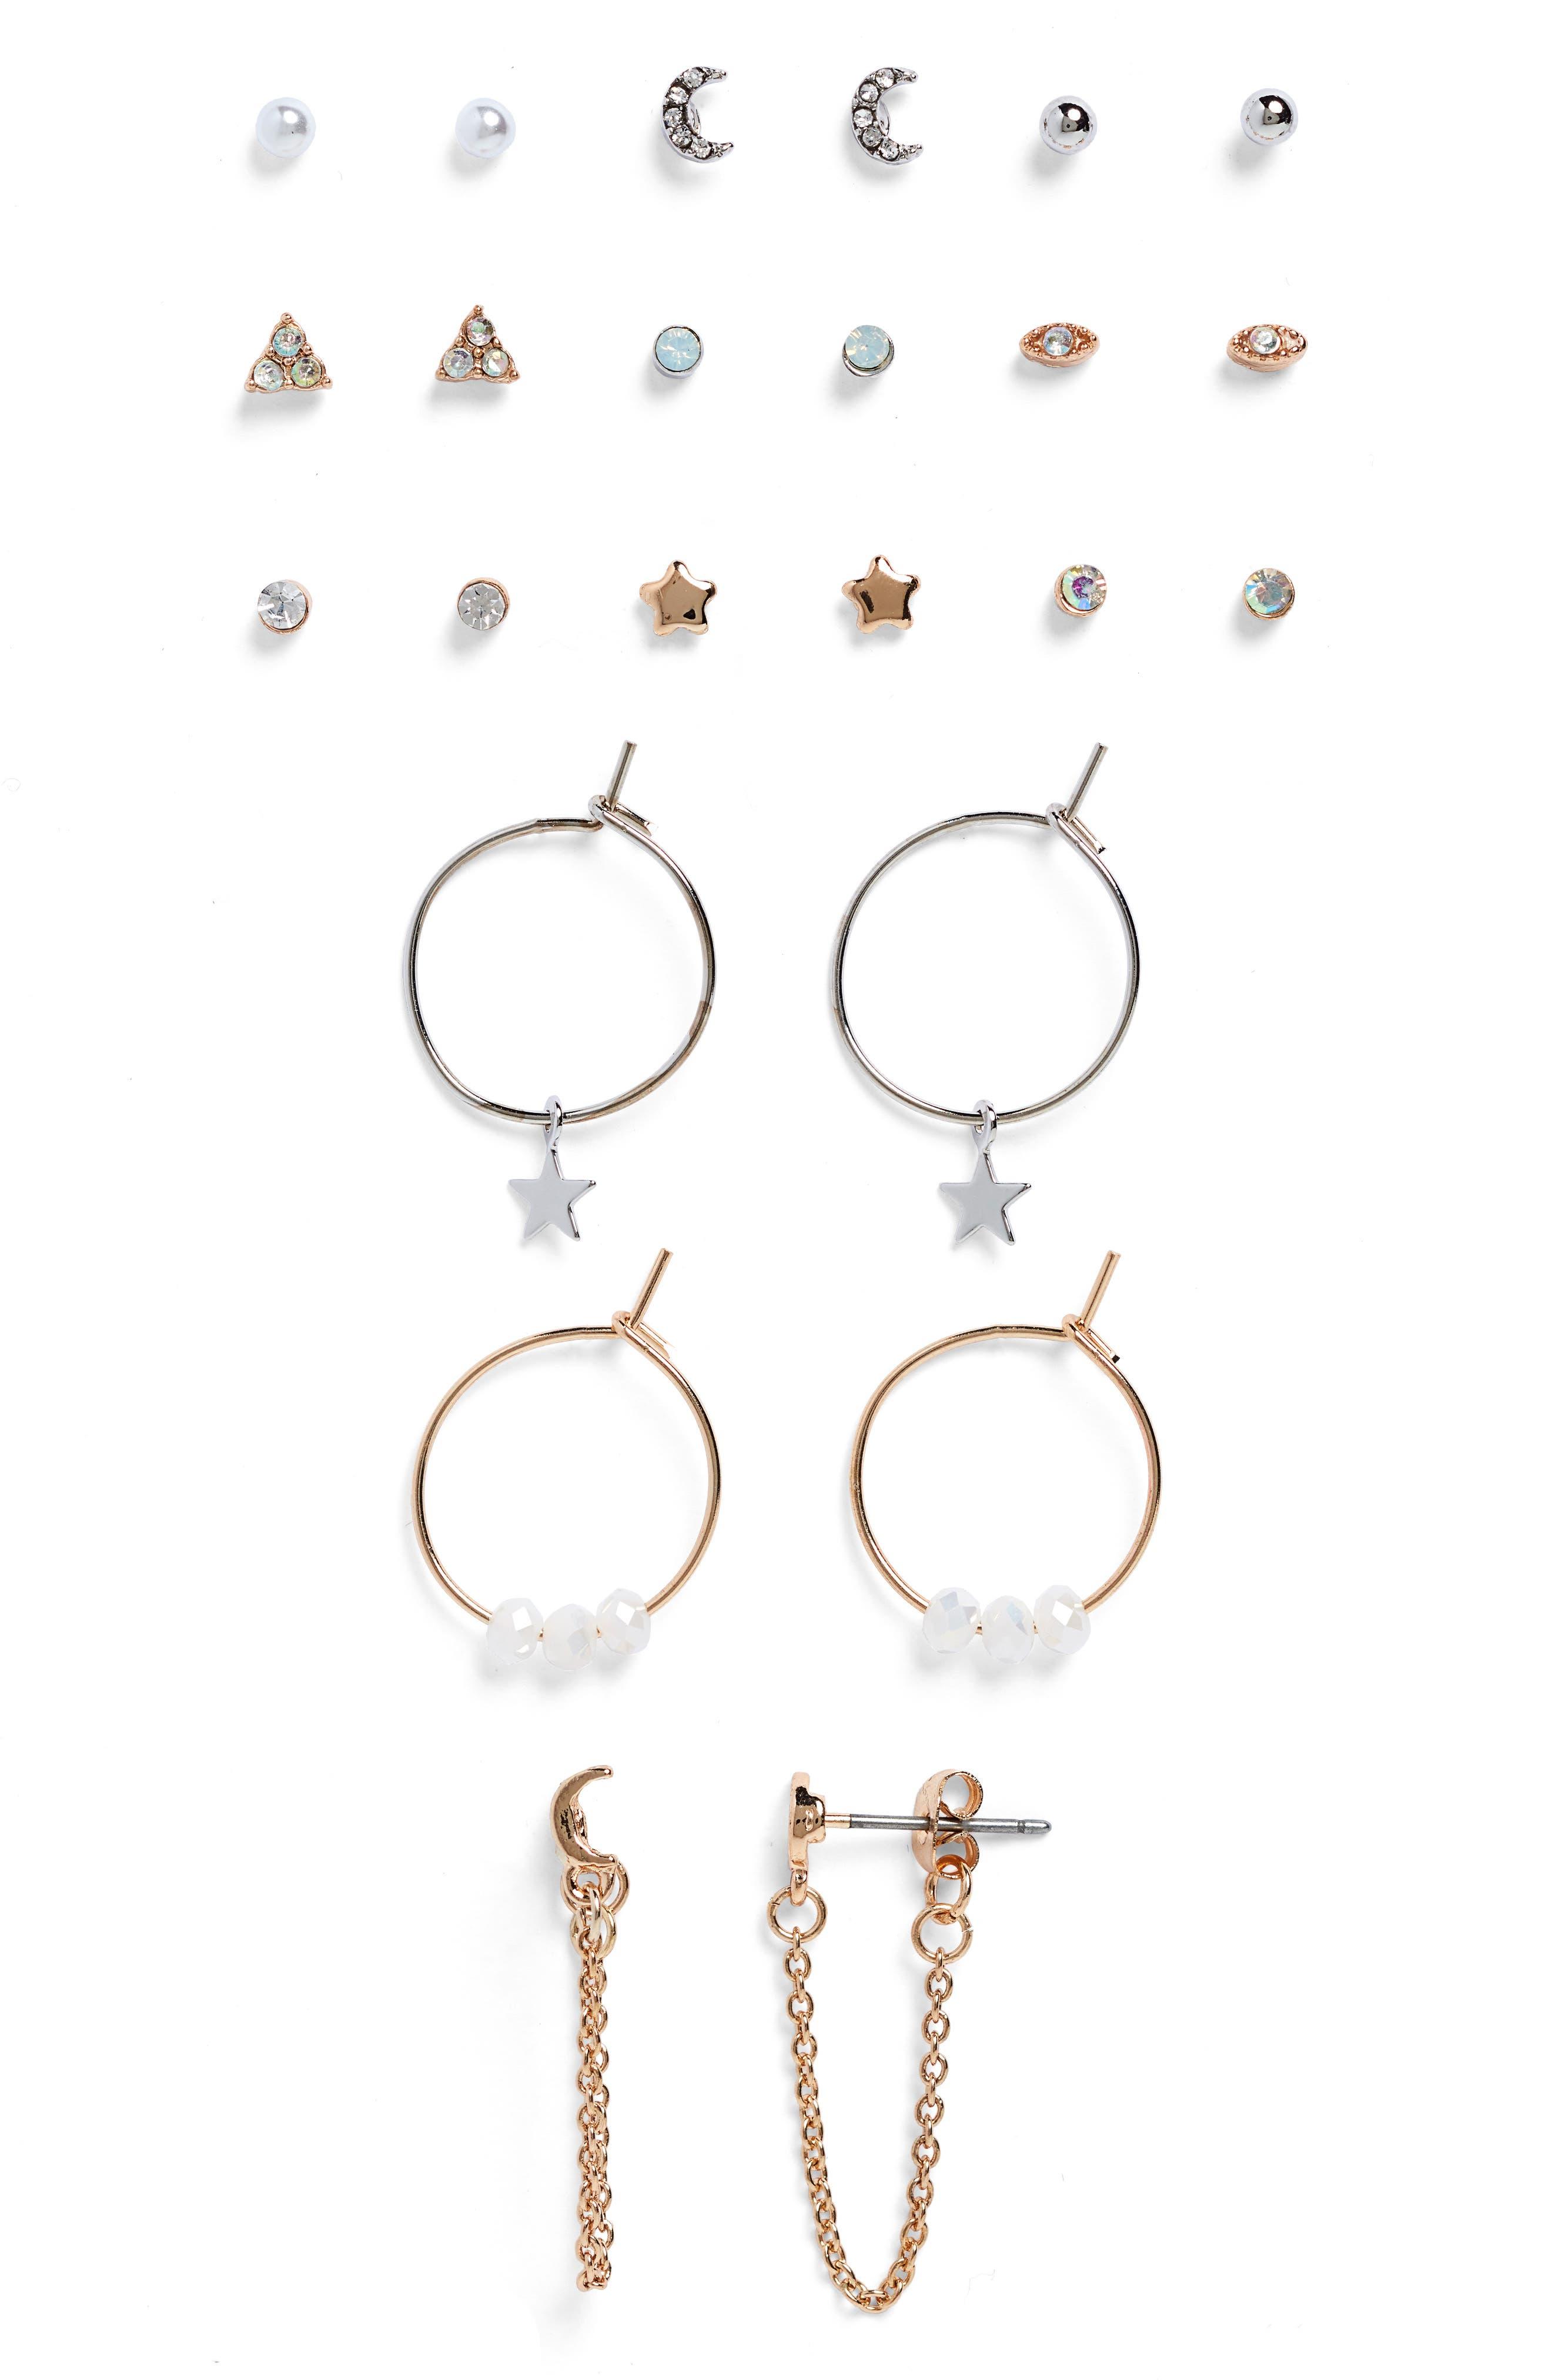 12-Pack Earrings,                             Main thumbnail 1, color,                             960